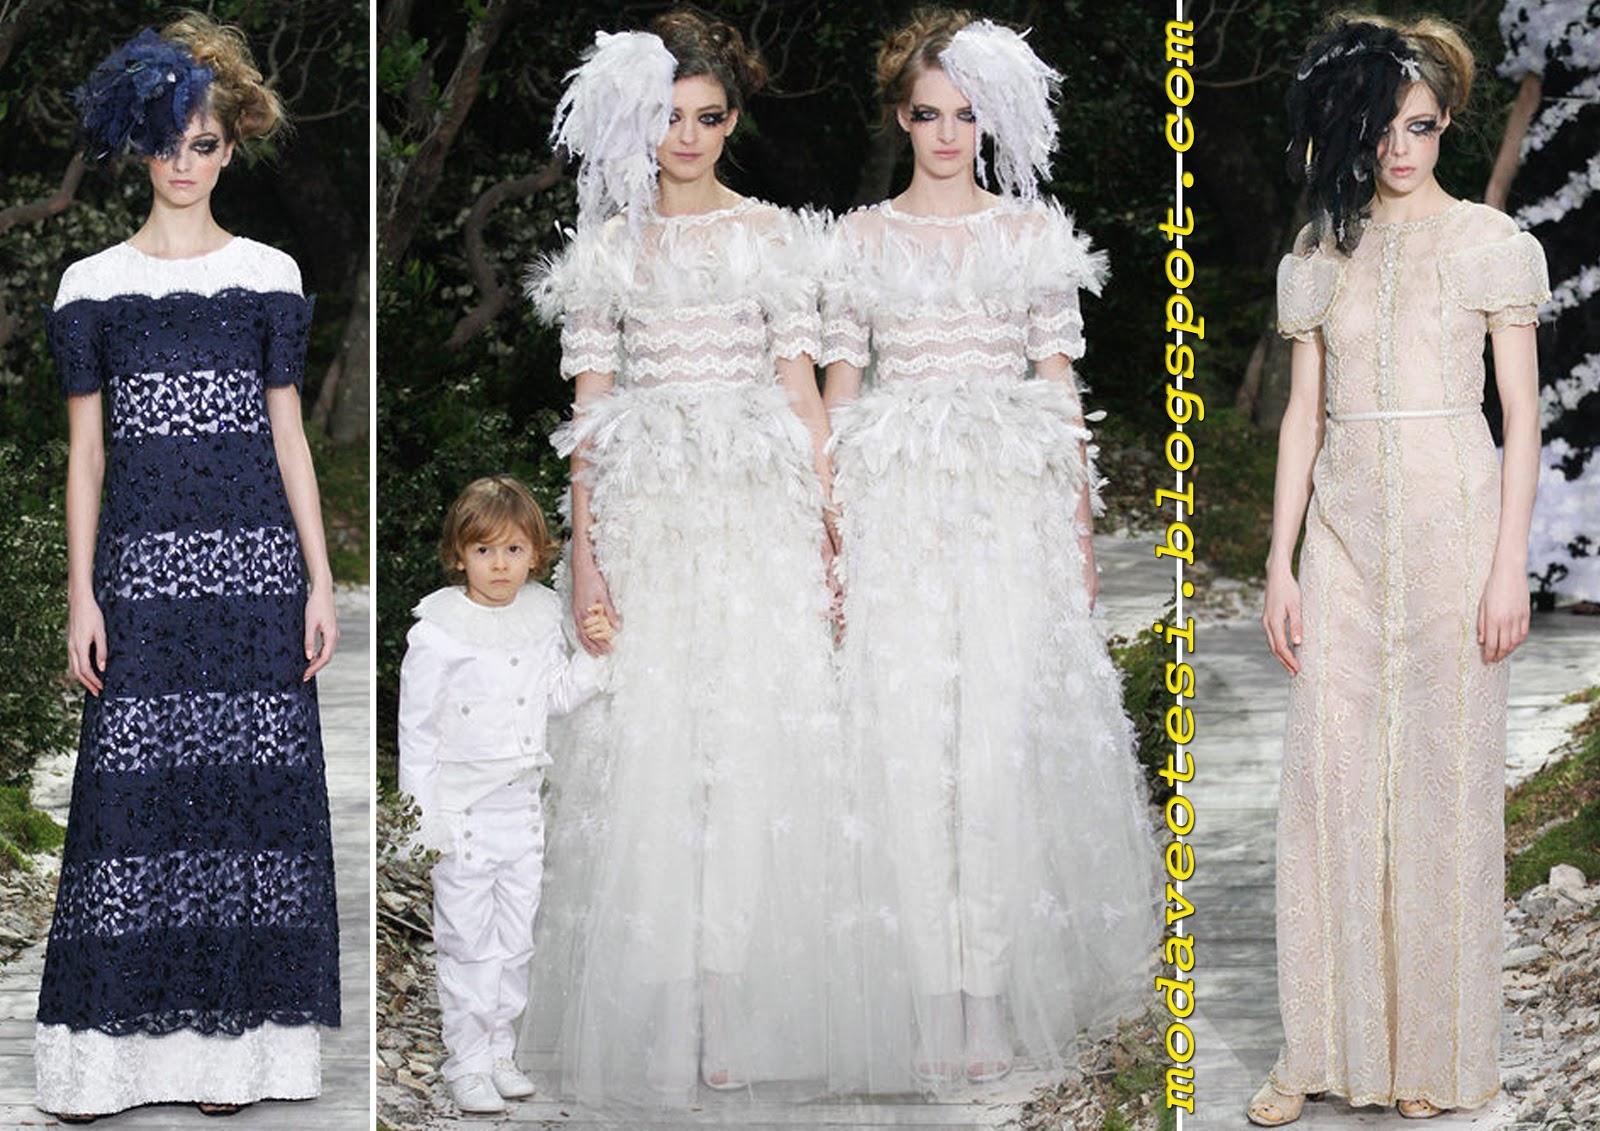 Twilight Saga Wedding Dress 91 Vintage Karl Lagerfeld yine yapti